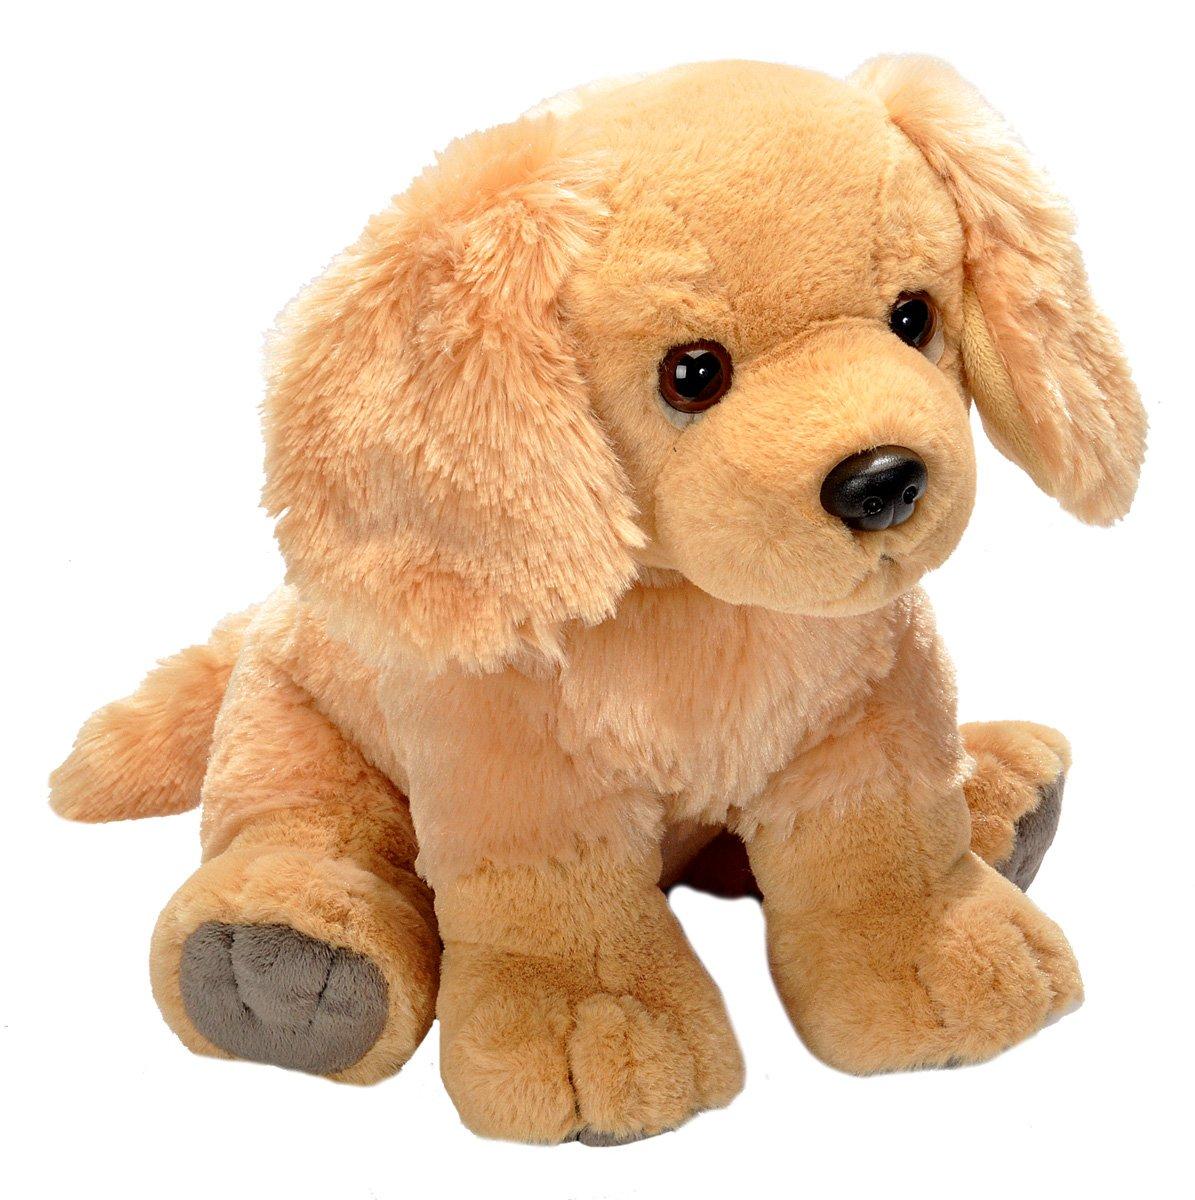 Wild Republic Golden Retriever Plush Stuffed Animal Plush Toy Gifts Kids Pet Shop 12 Inches